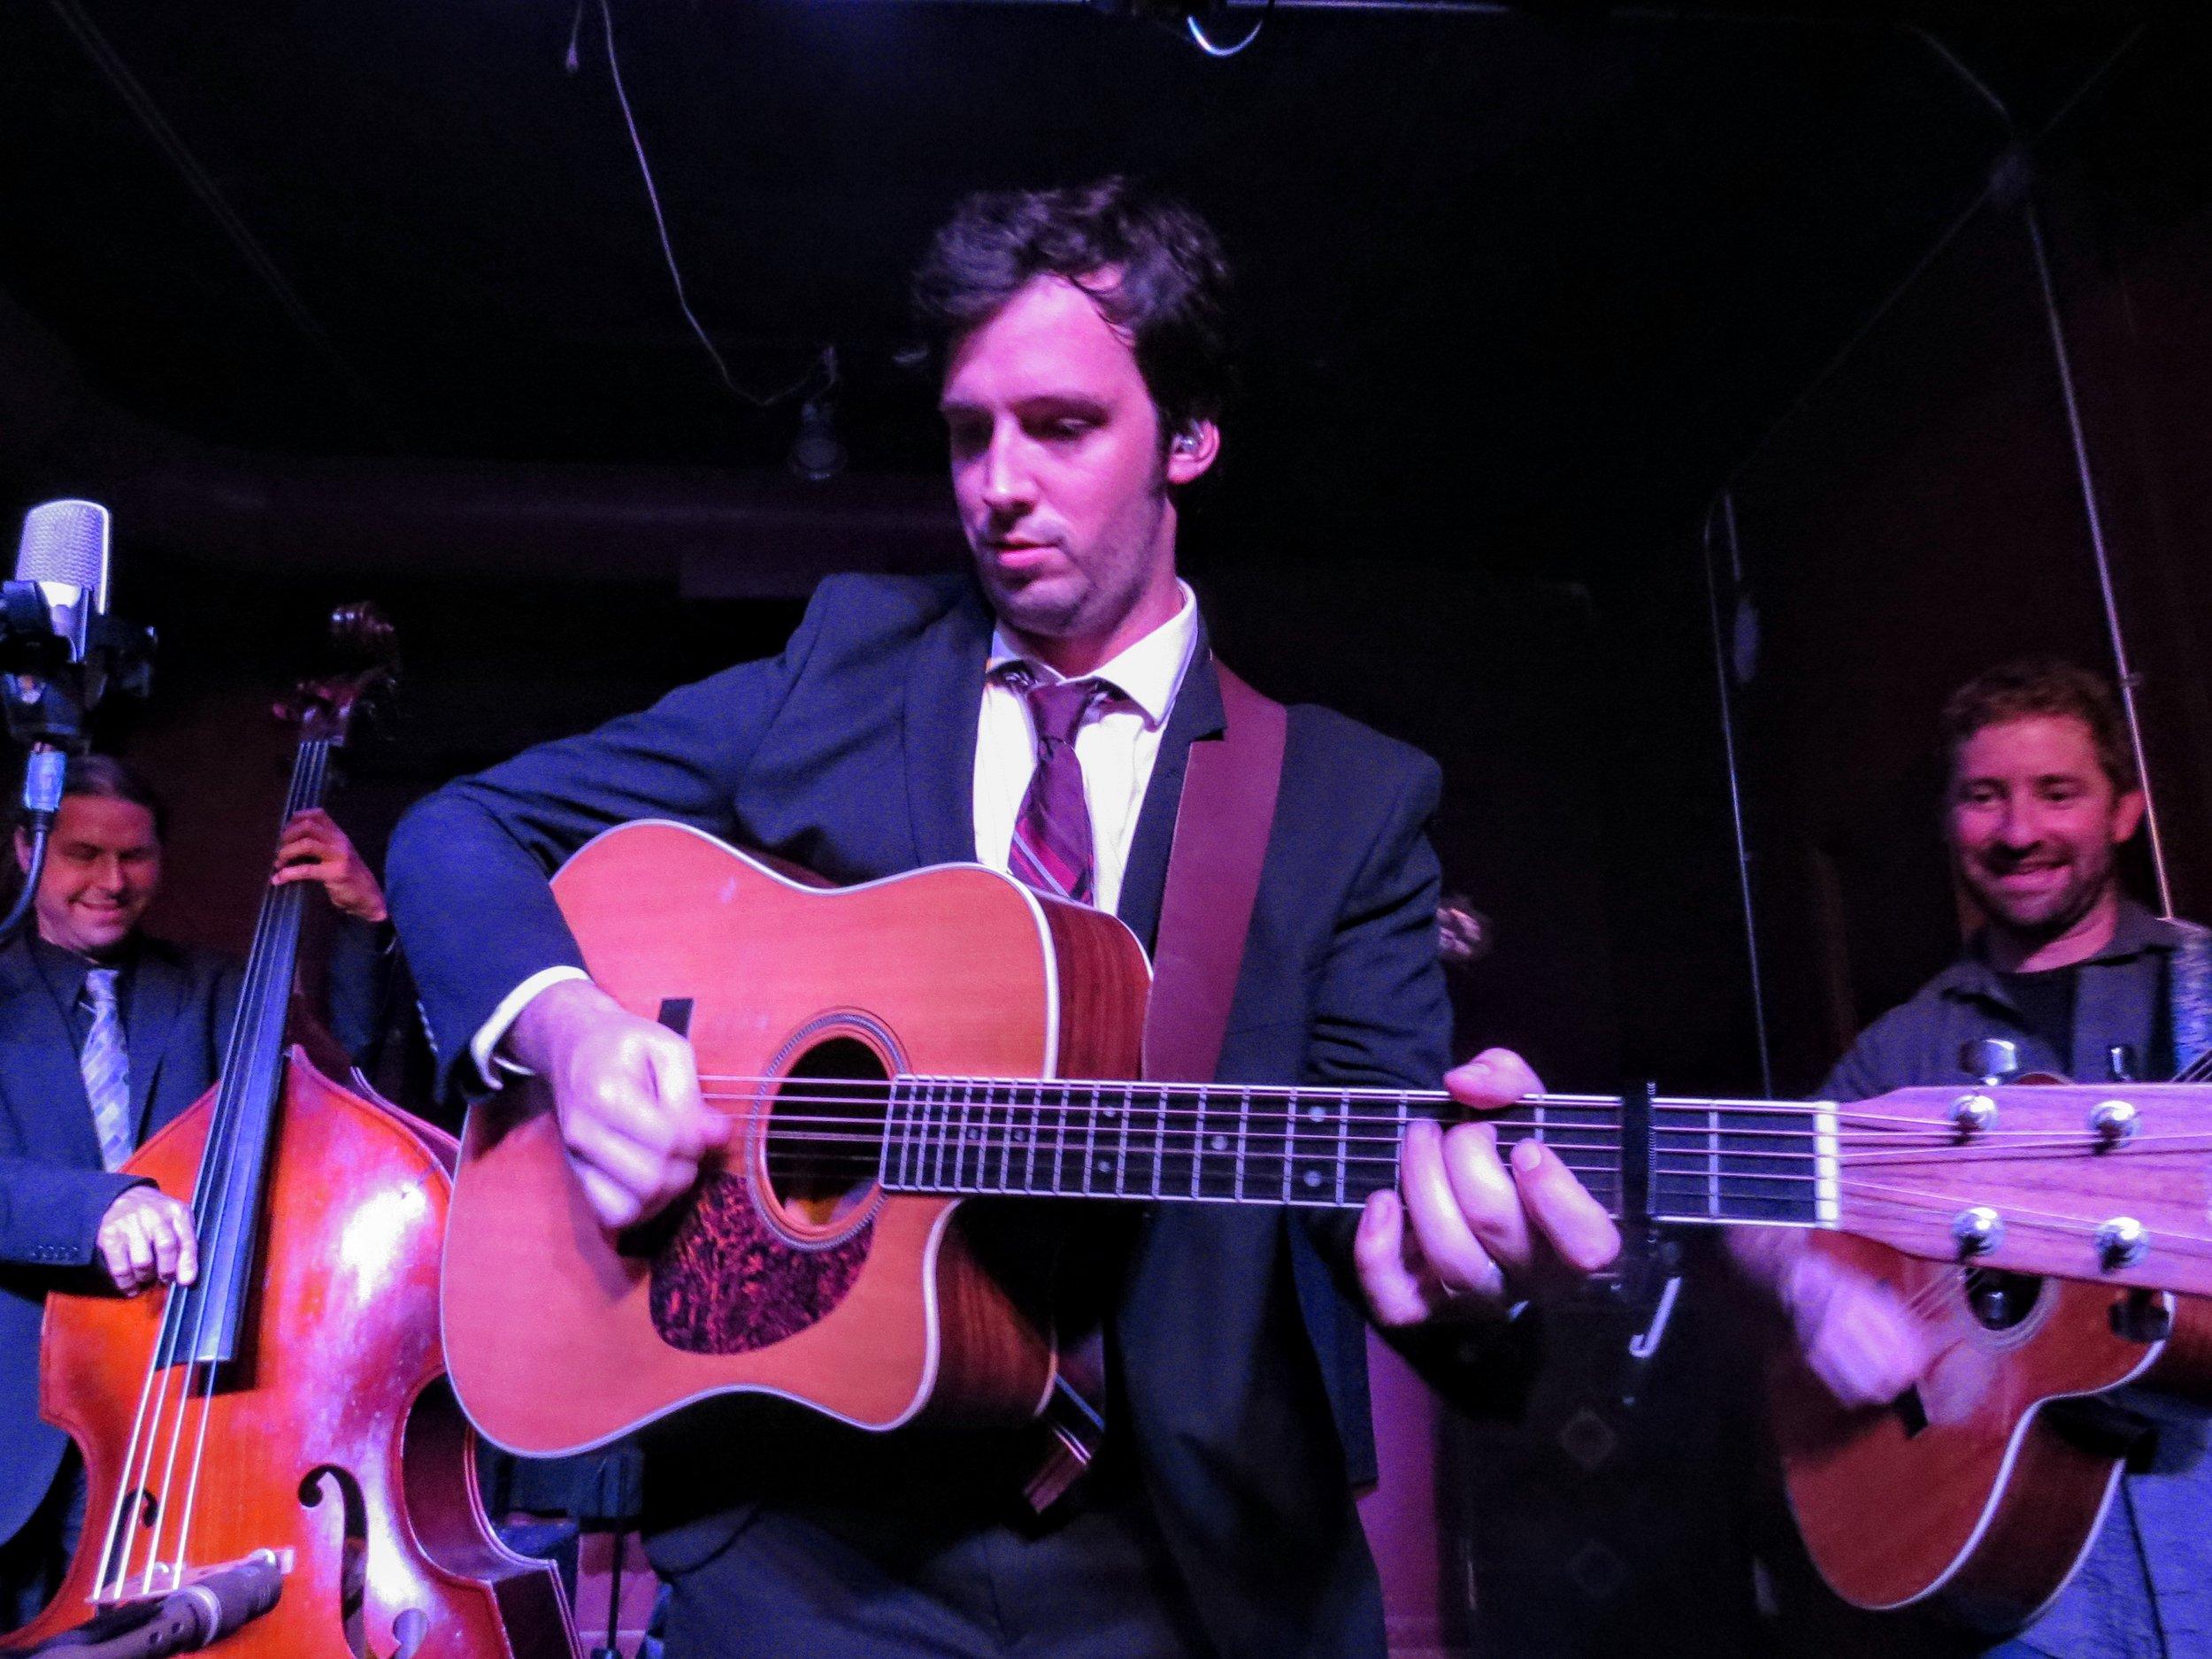 Aaron Dorfman and Chris Dollar shredded guitar all night long!